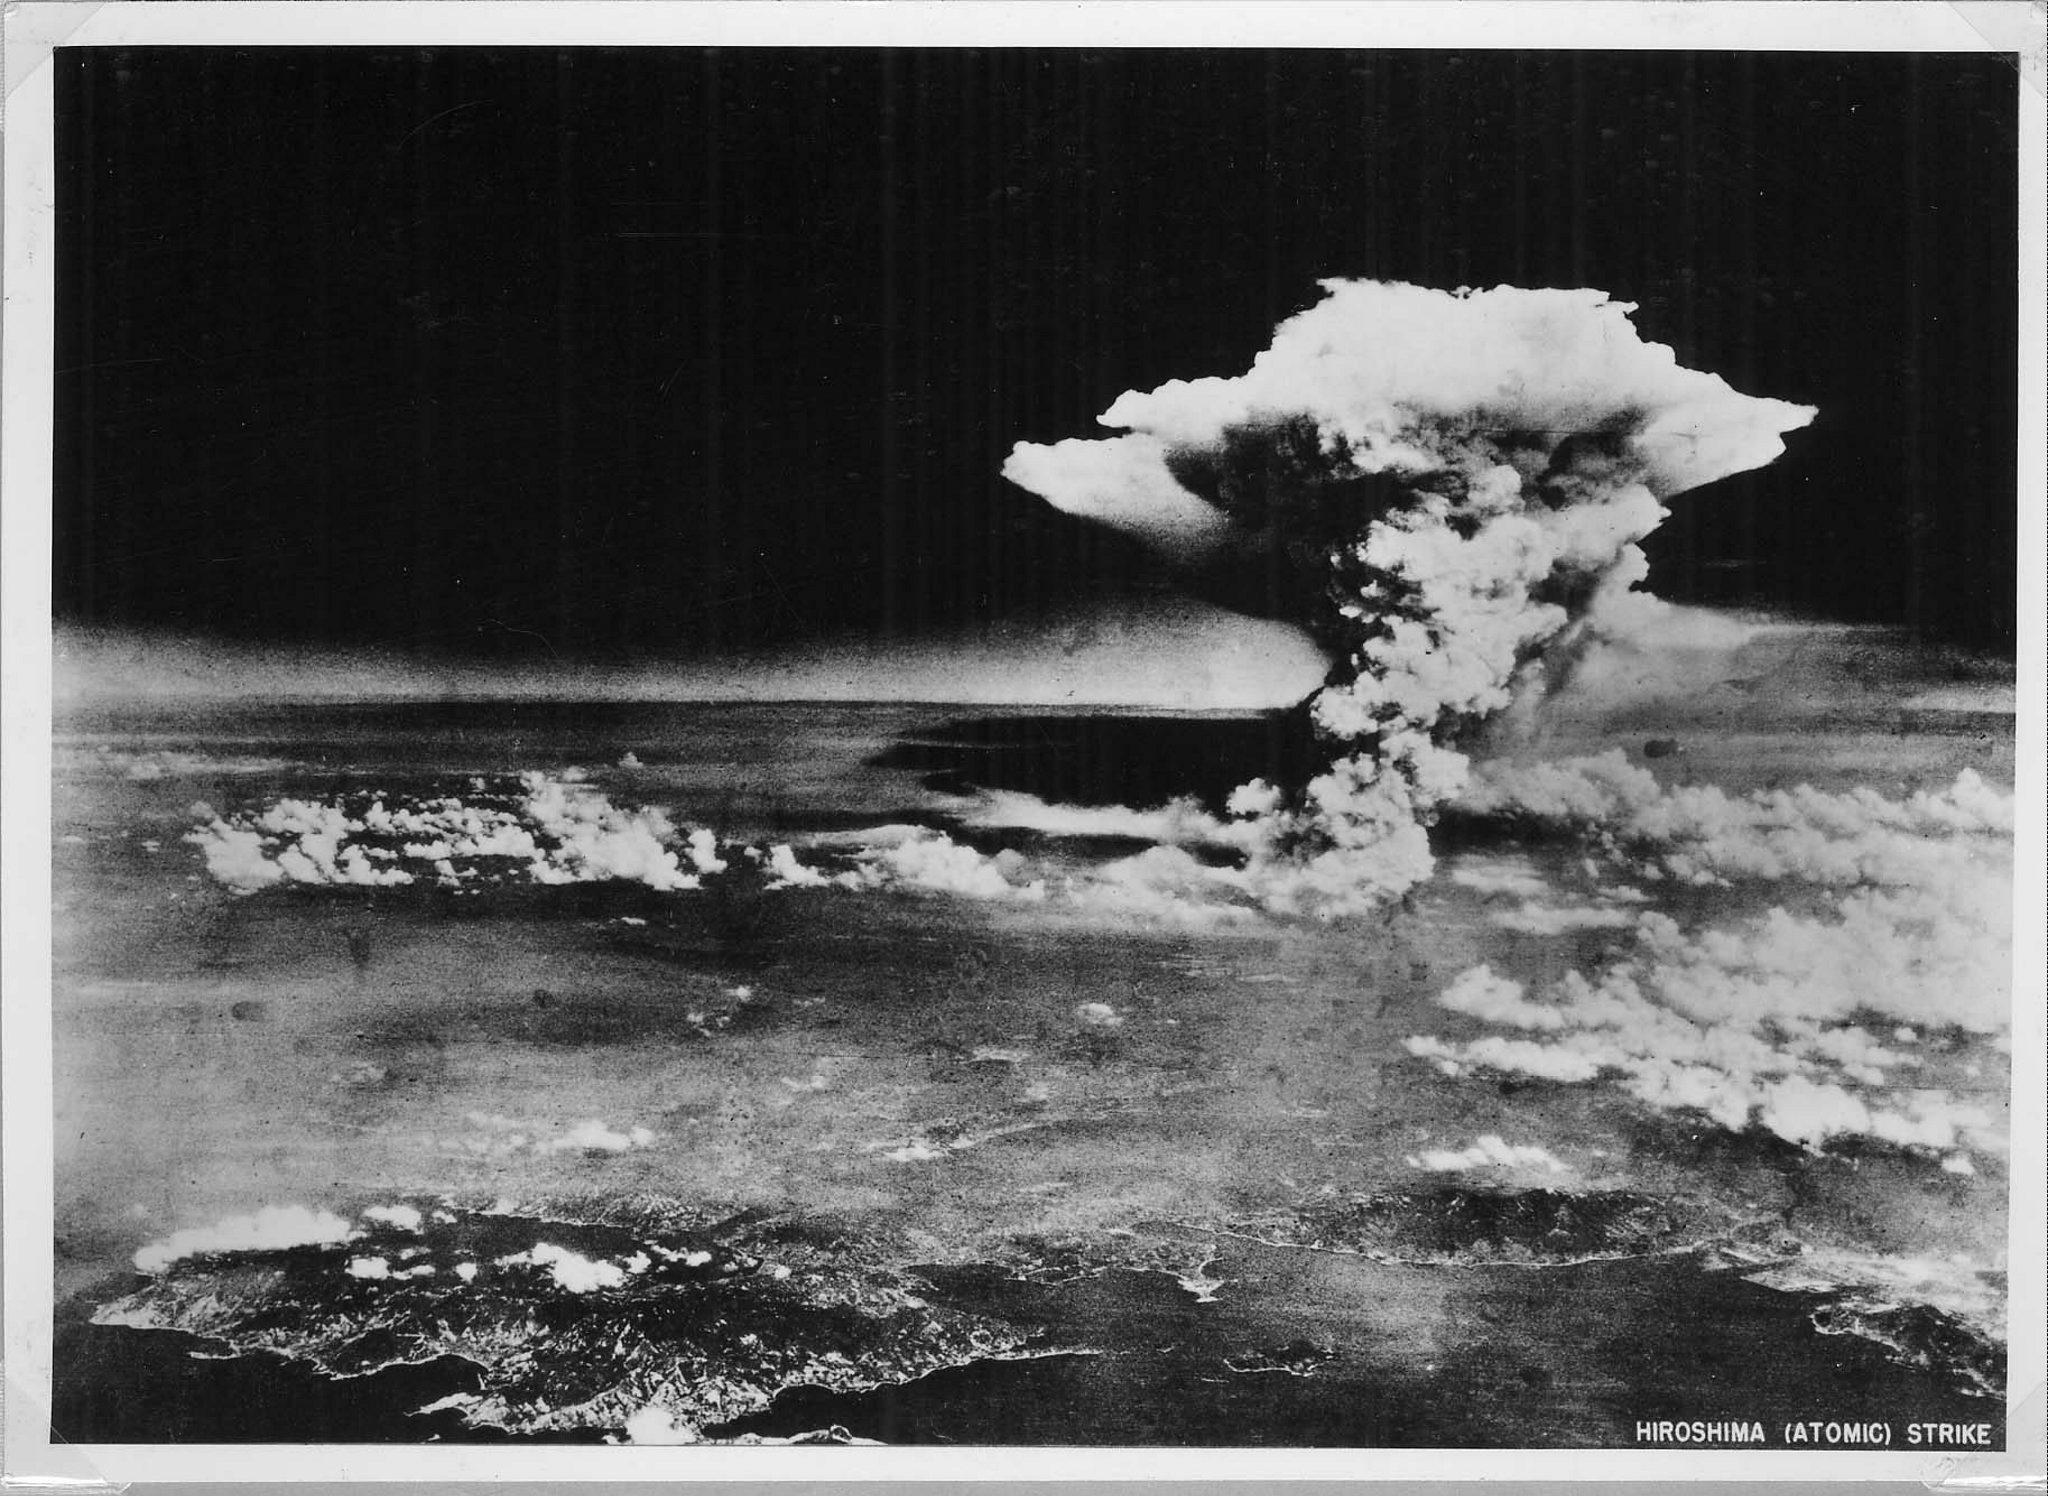 Extra NOS-programma herdenking Hiroshima